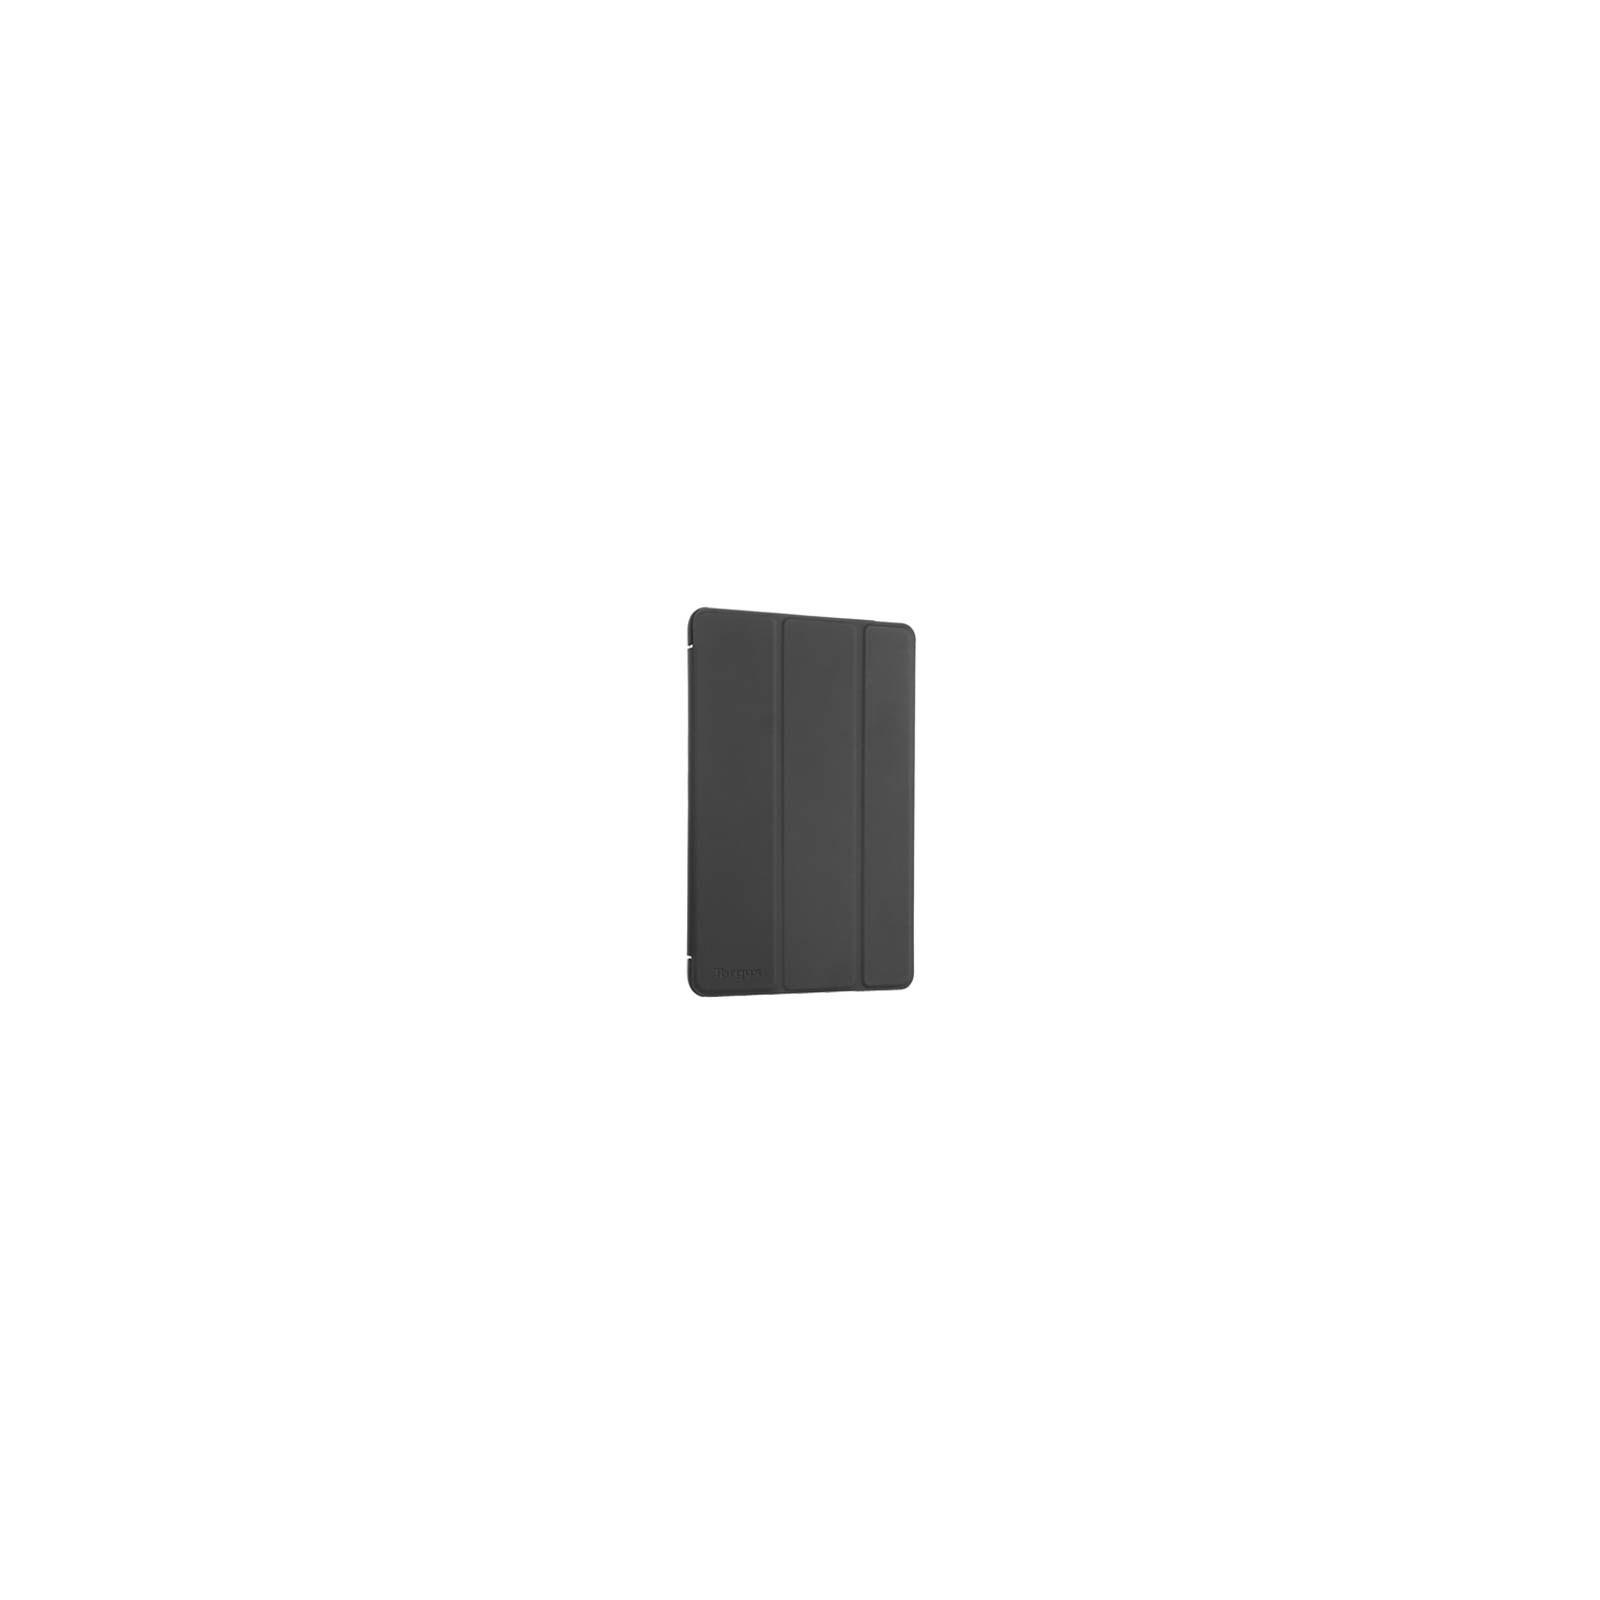 Чехол для планшета Targus iPad mini (THD043EU)